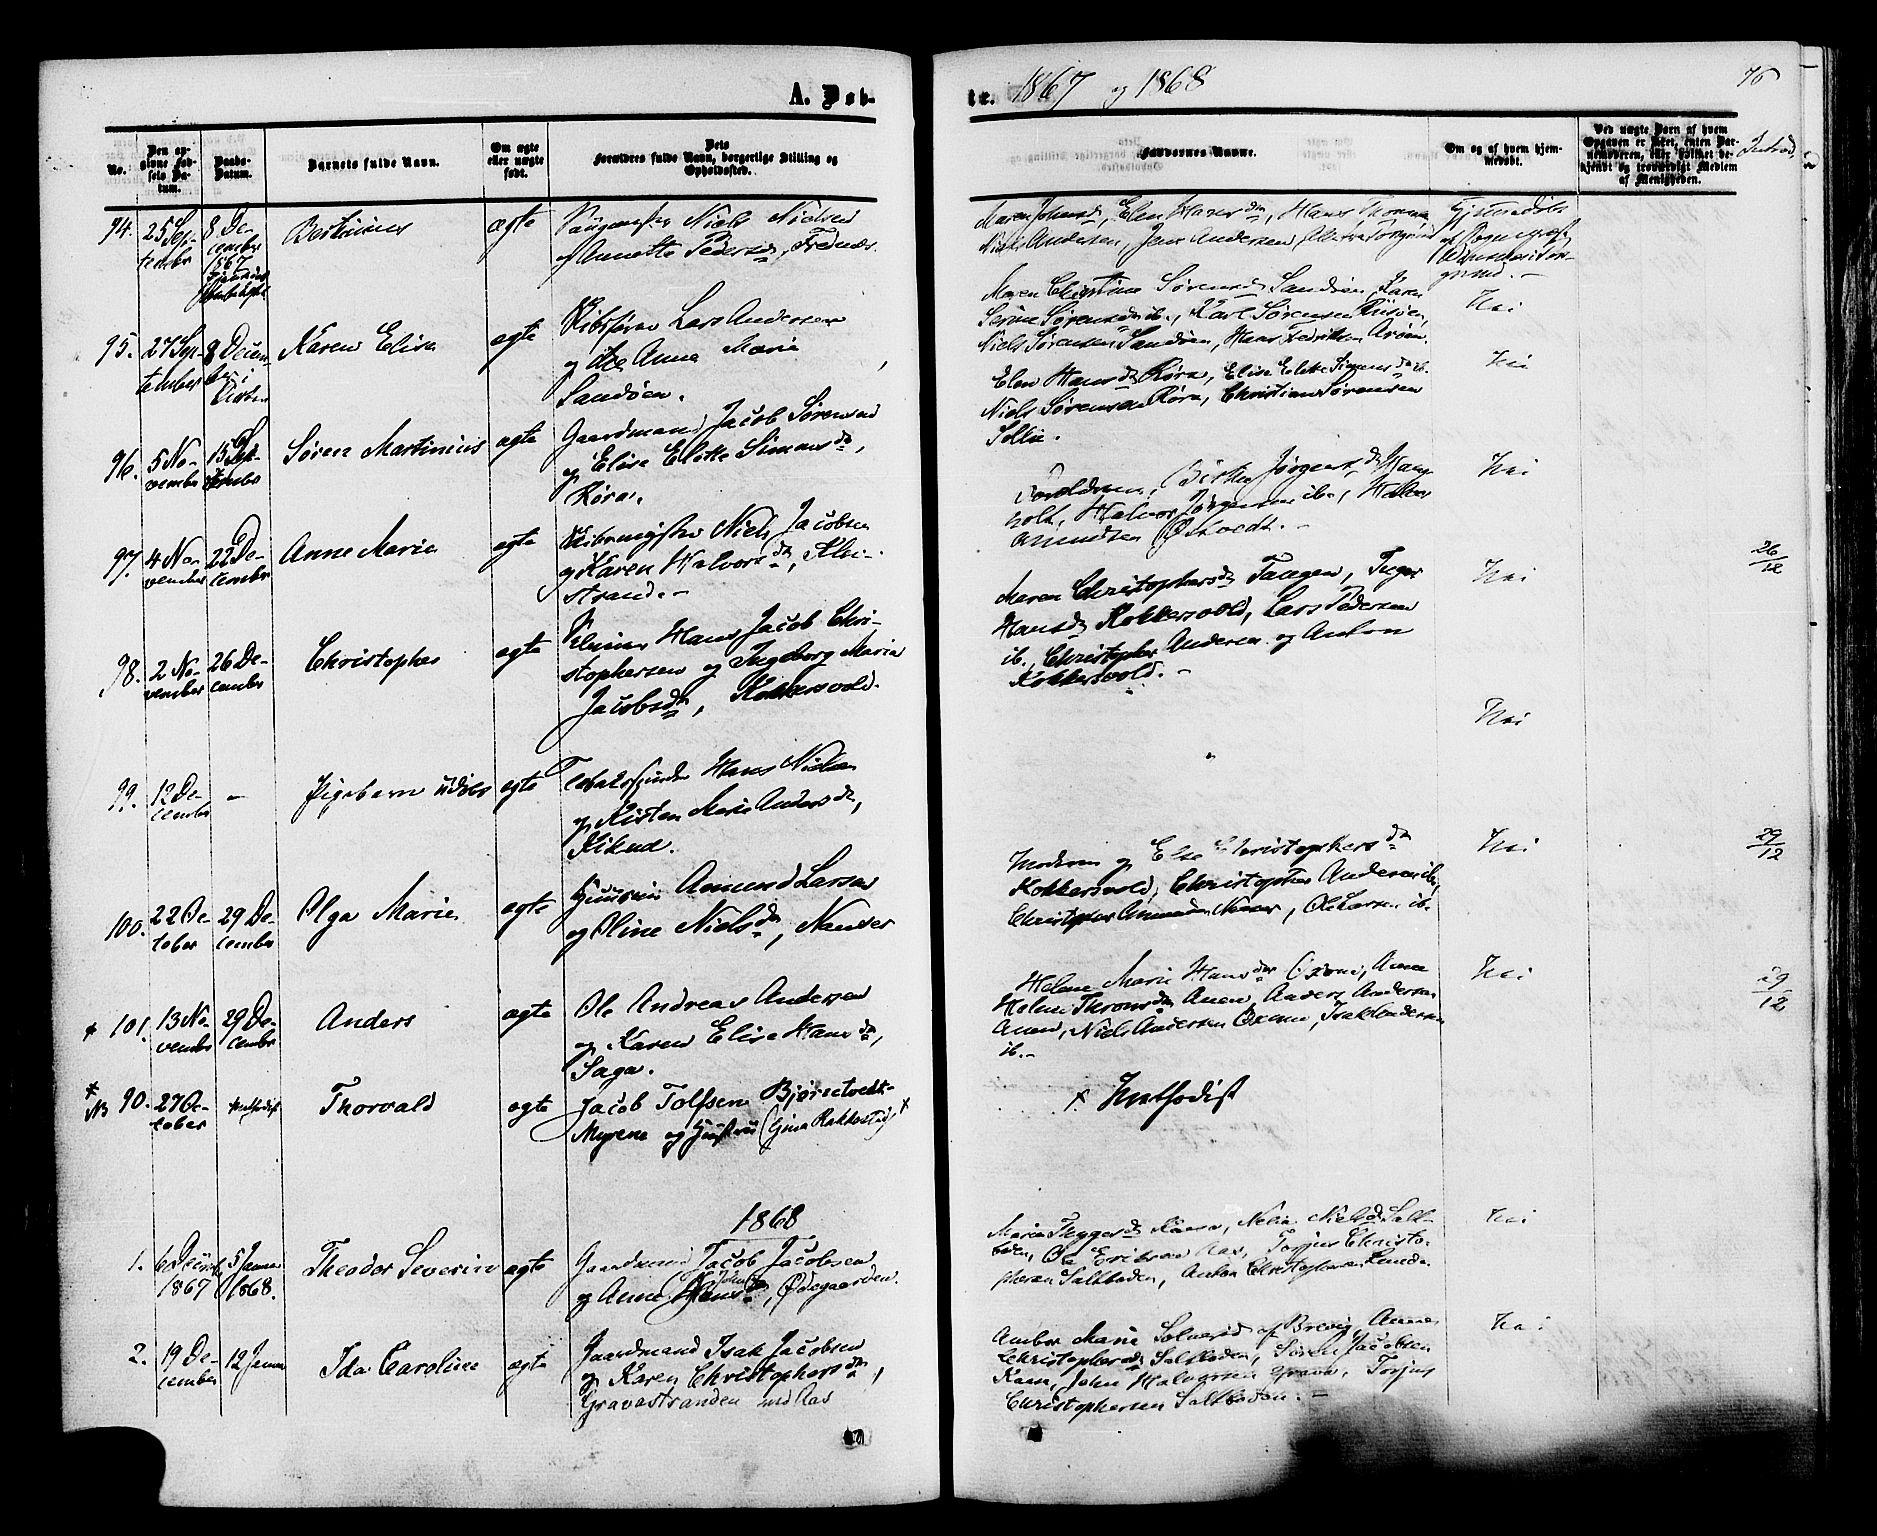 SAKO, Eidanger kirkebøker, F/Fa/L0010: Parish register (official) no. 10, 1859-1874, p. 76